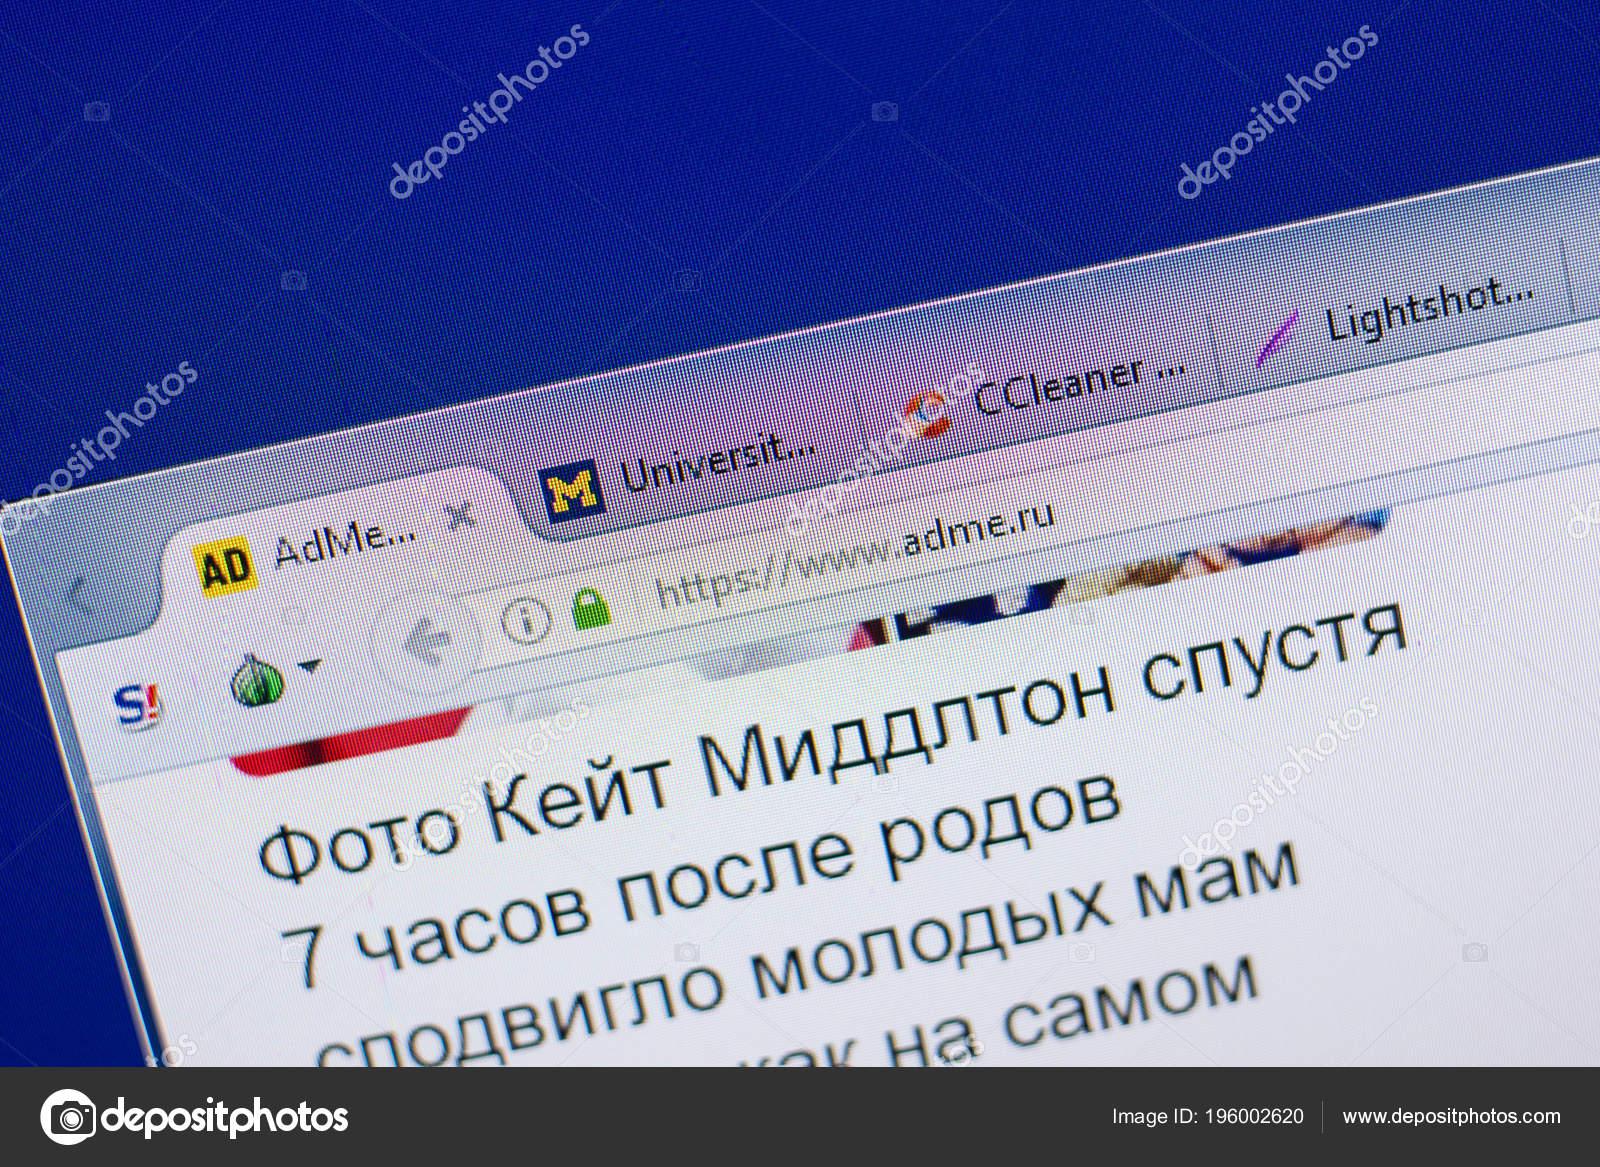 Ryazan Rusia Mayo 2018 Sitio Web Adme Pantalla Del Url